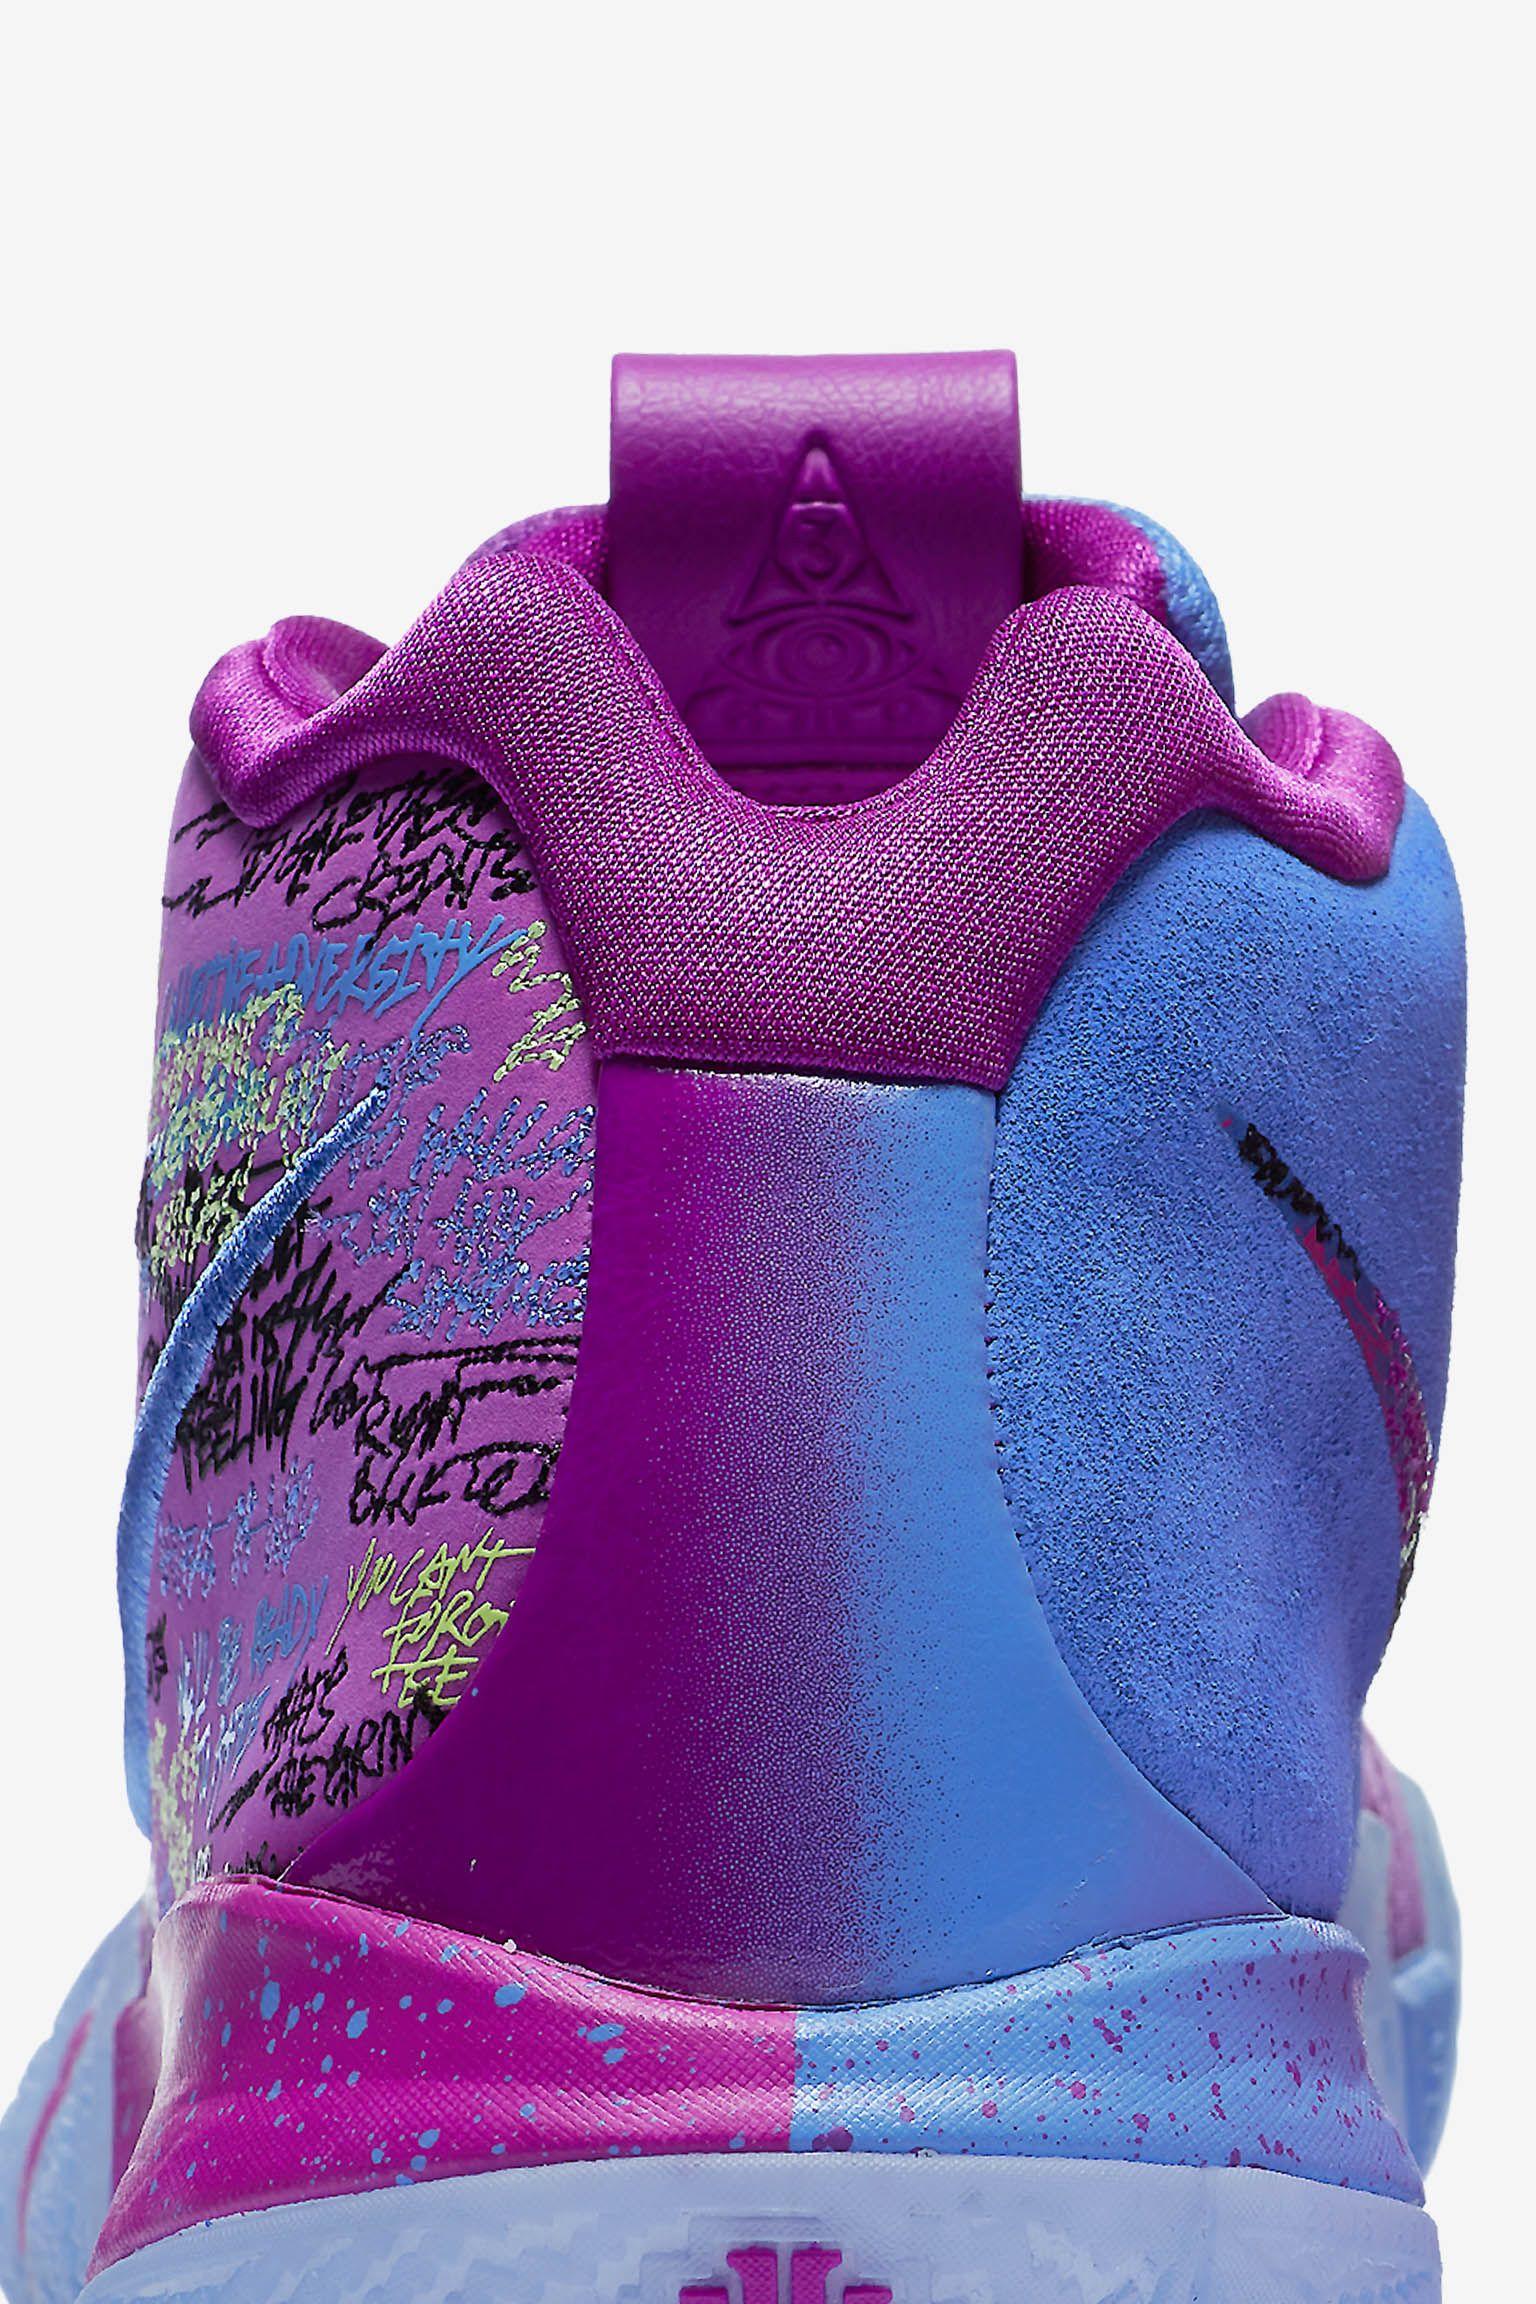 Nike Kyrie 4 'Confetti' Release Date